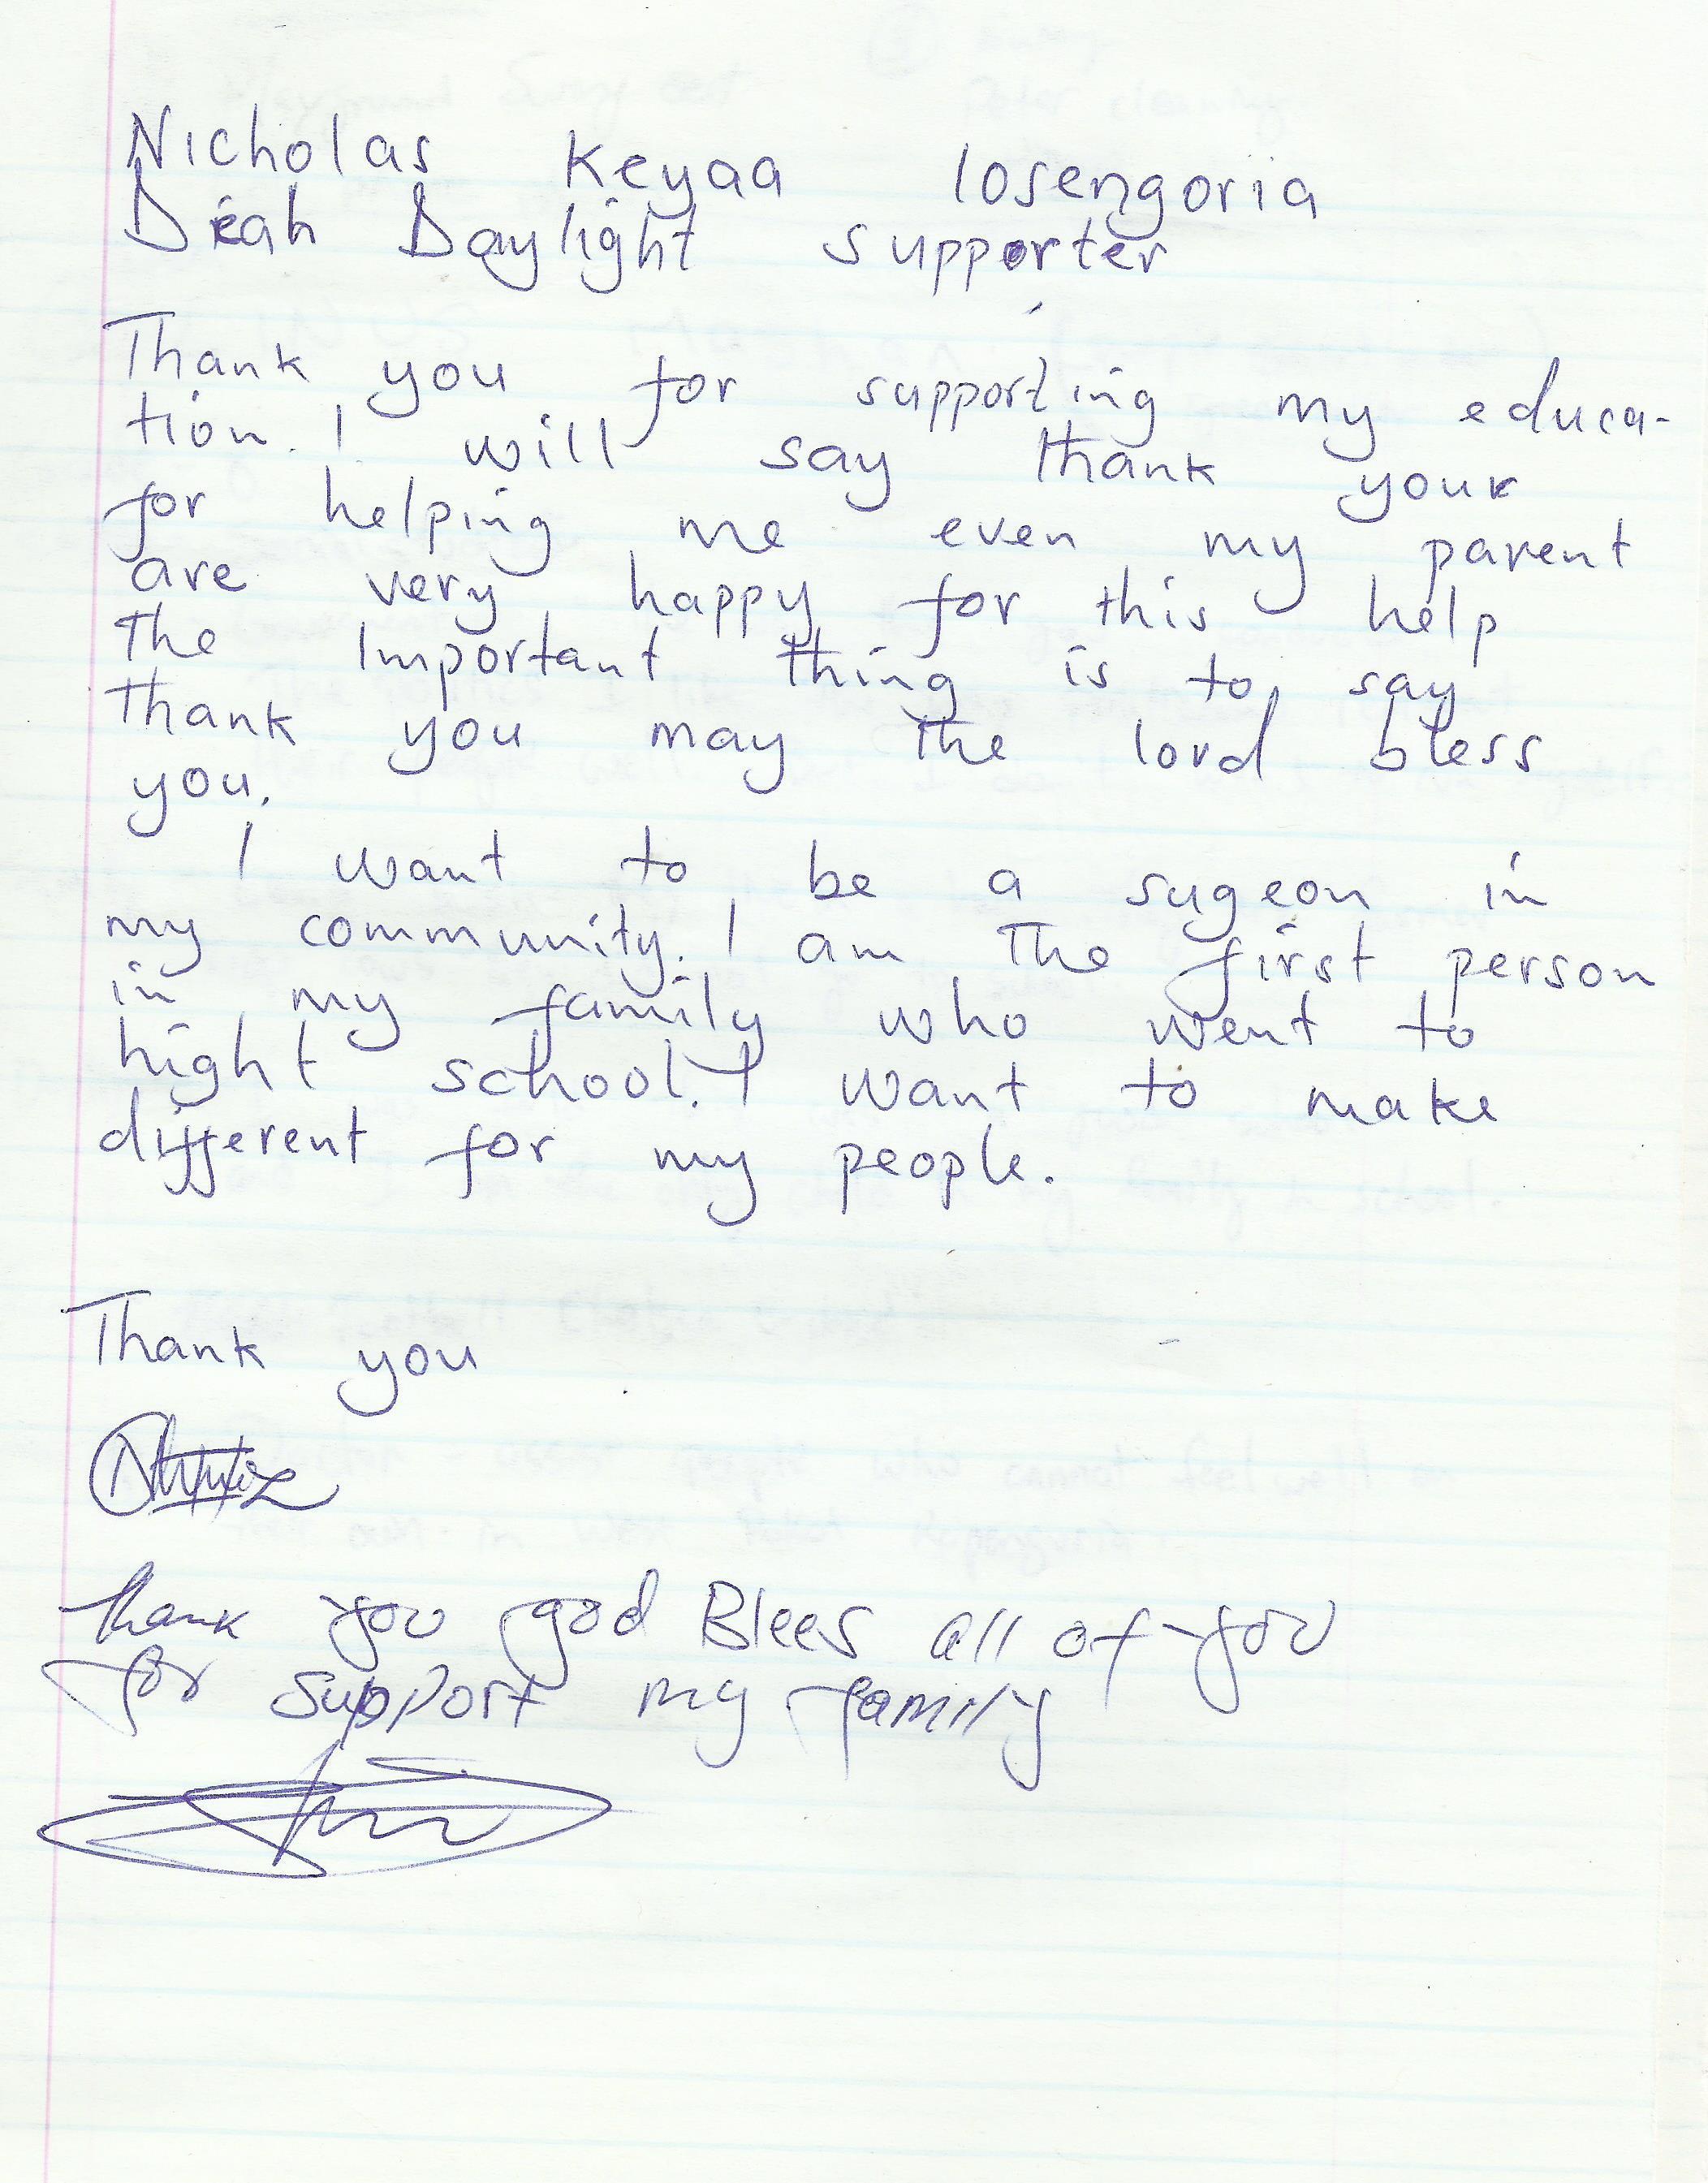 1 Nicholas Kaaya Letter